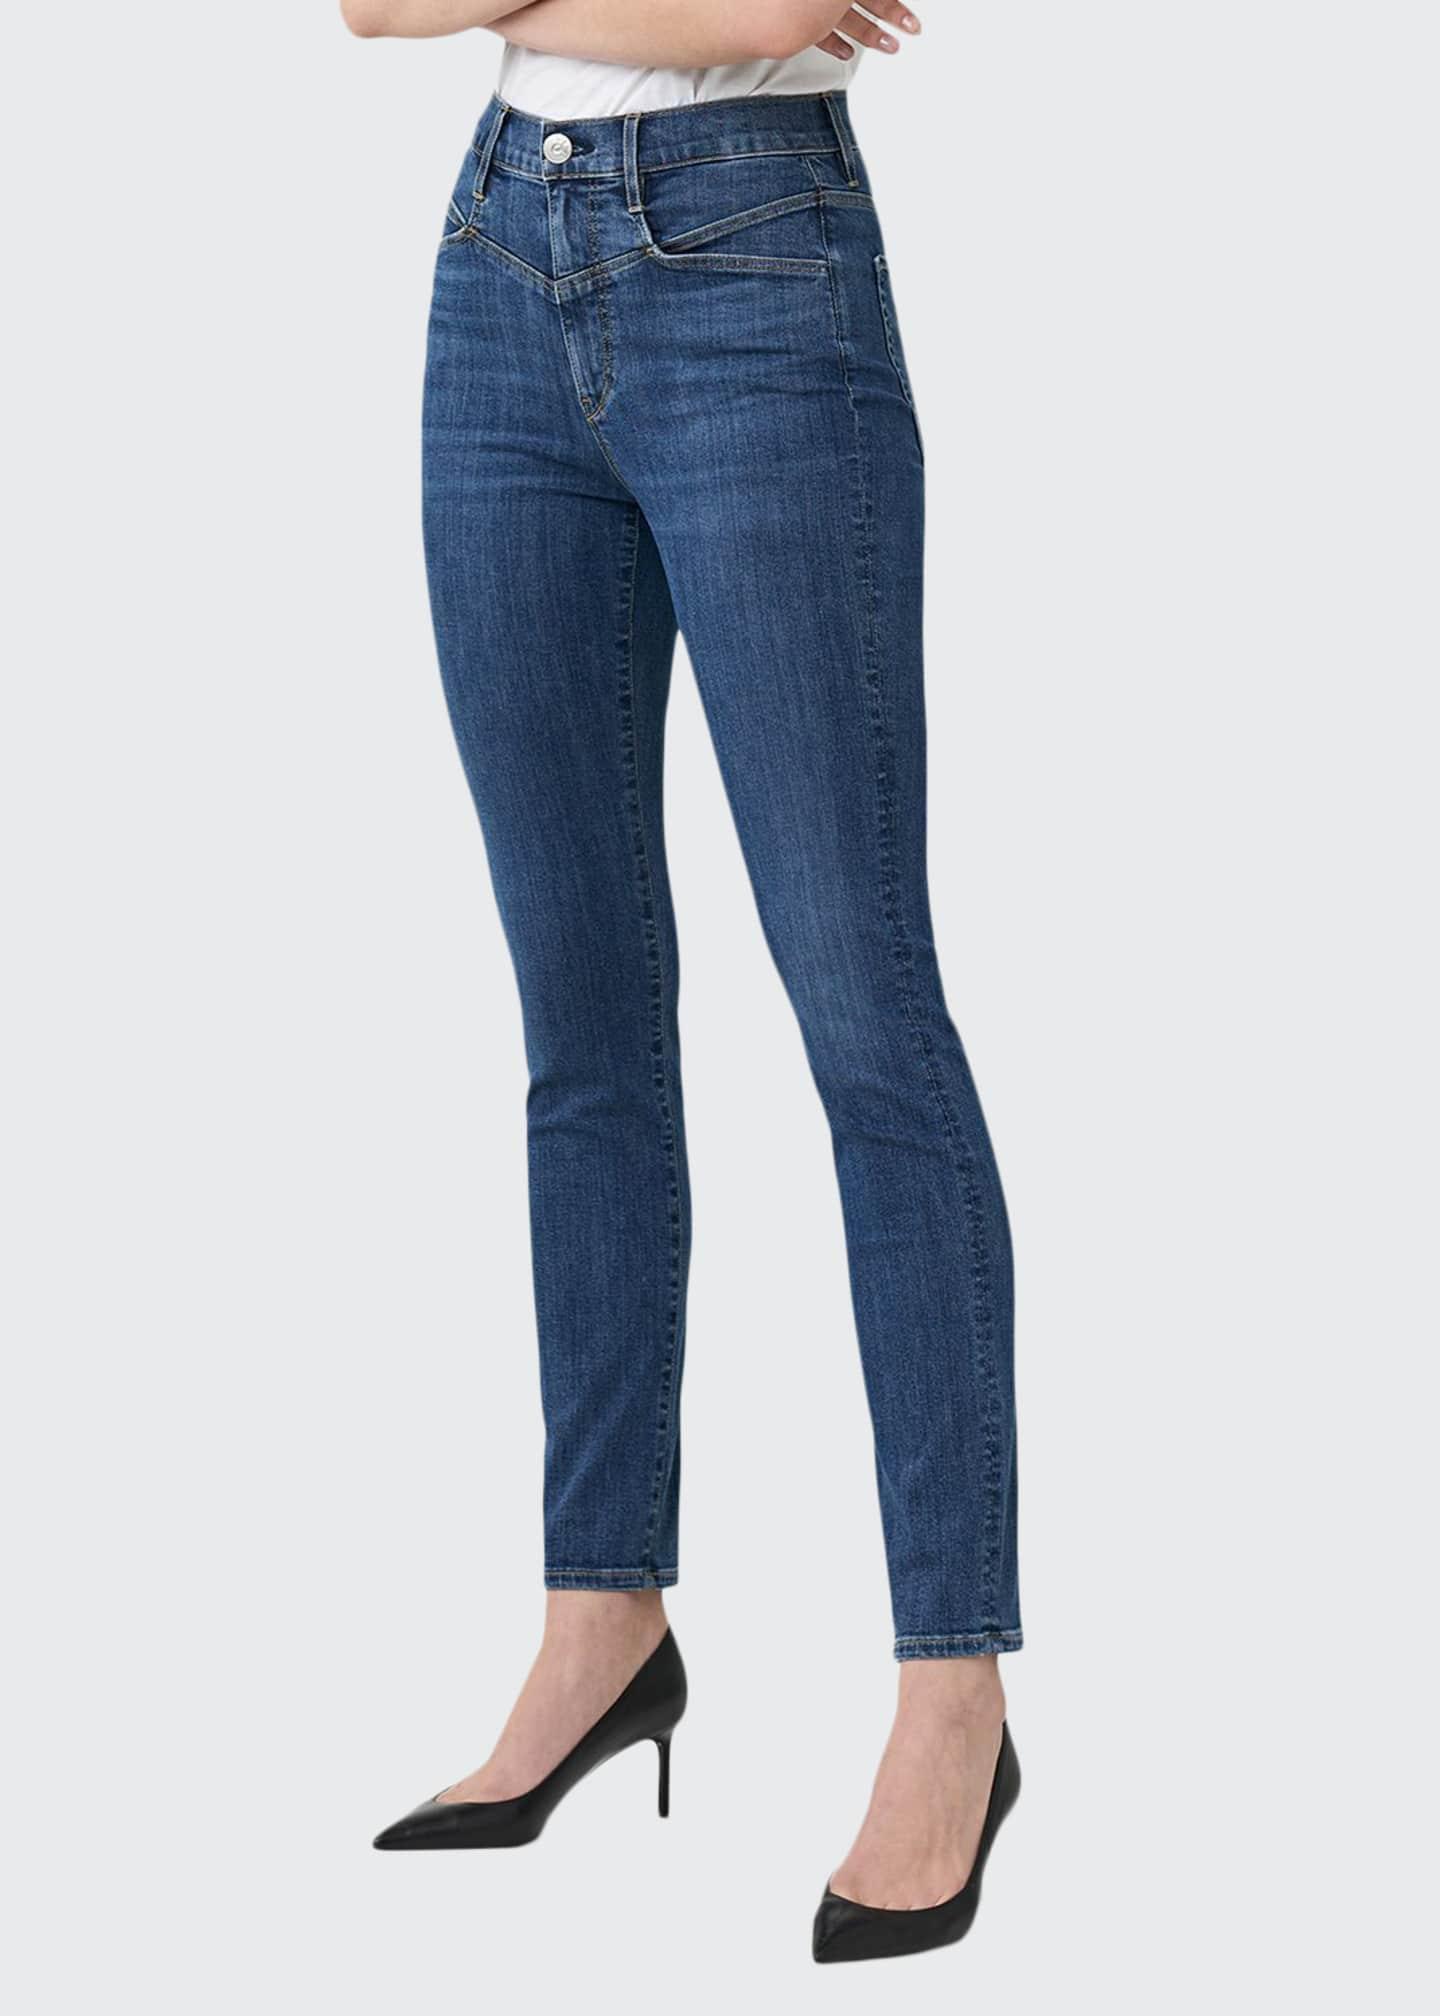 3x1 Jesse Straight-Leg Ankle Jeans with Yoke